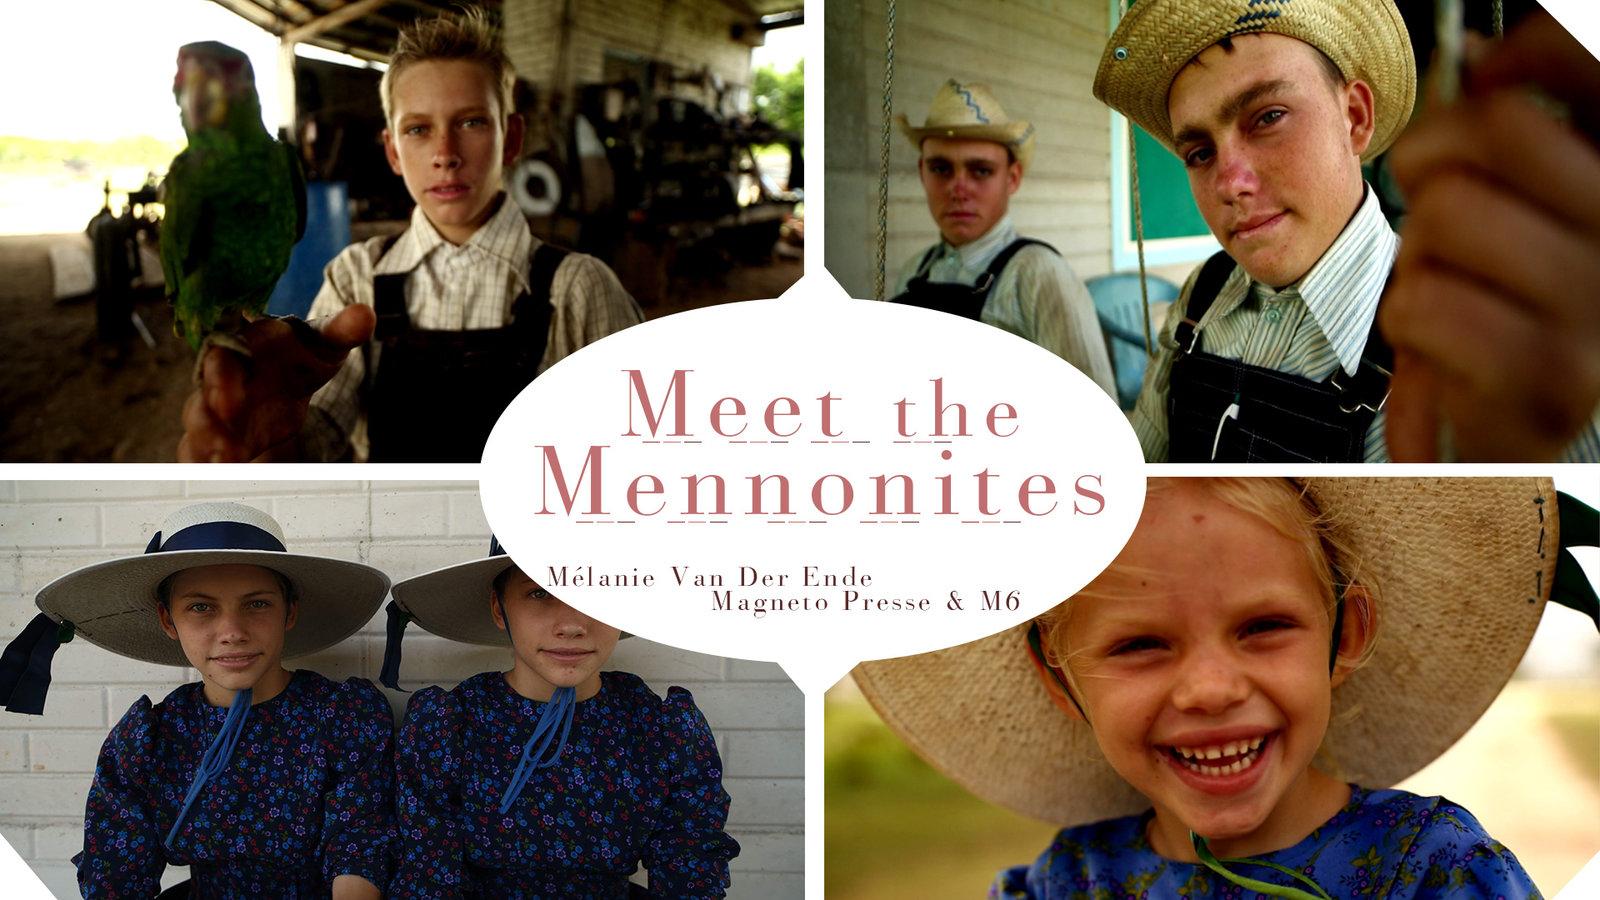 Meet the Mennonites - An Ultra-Conservative Christian Community